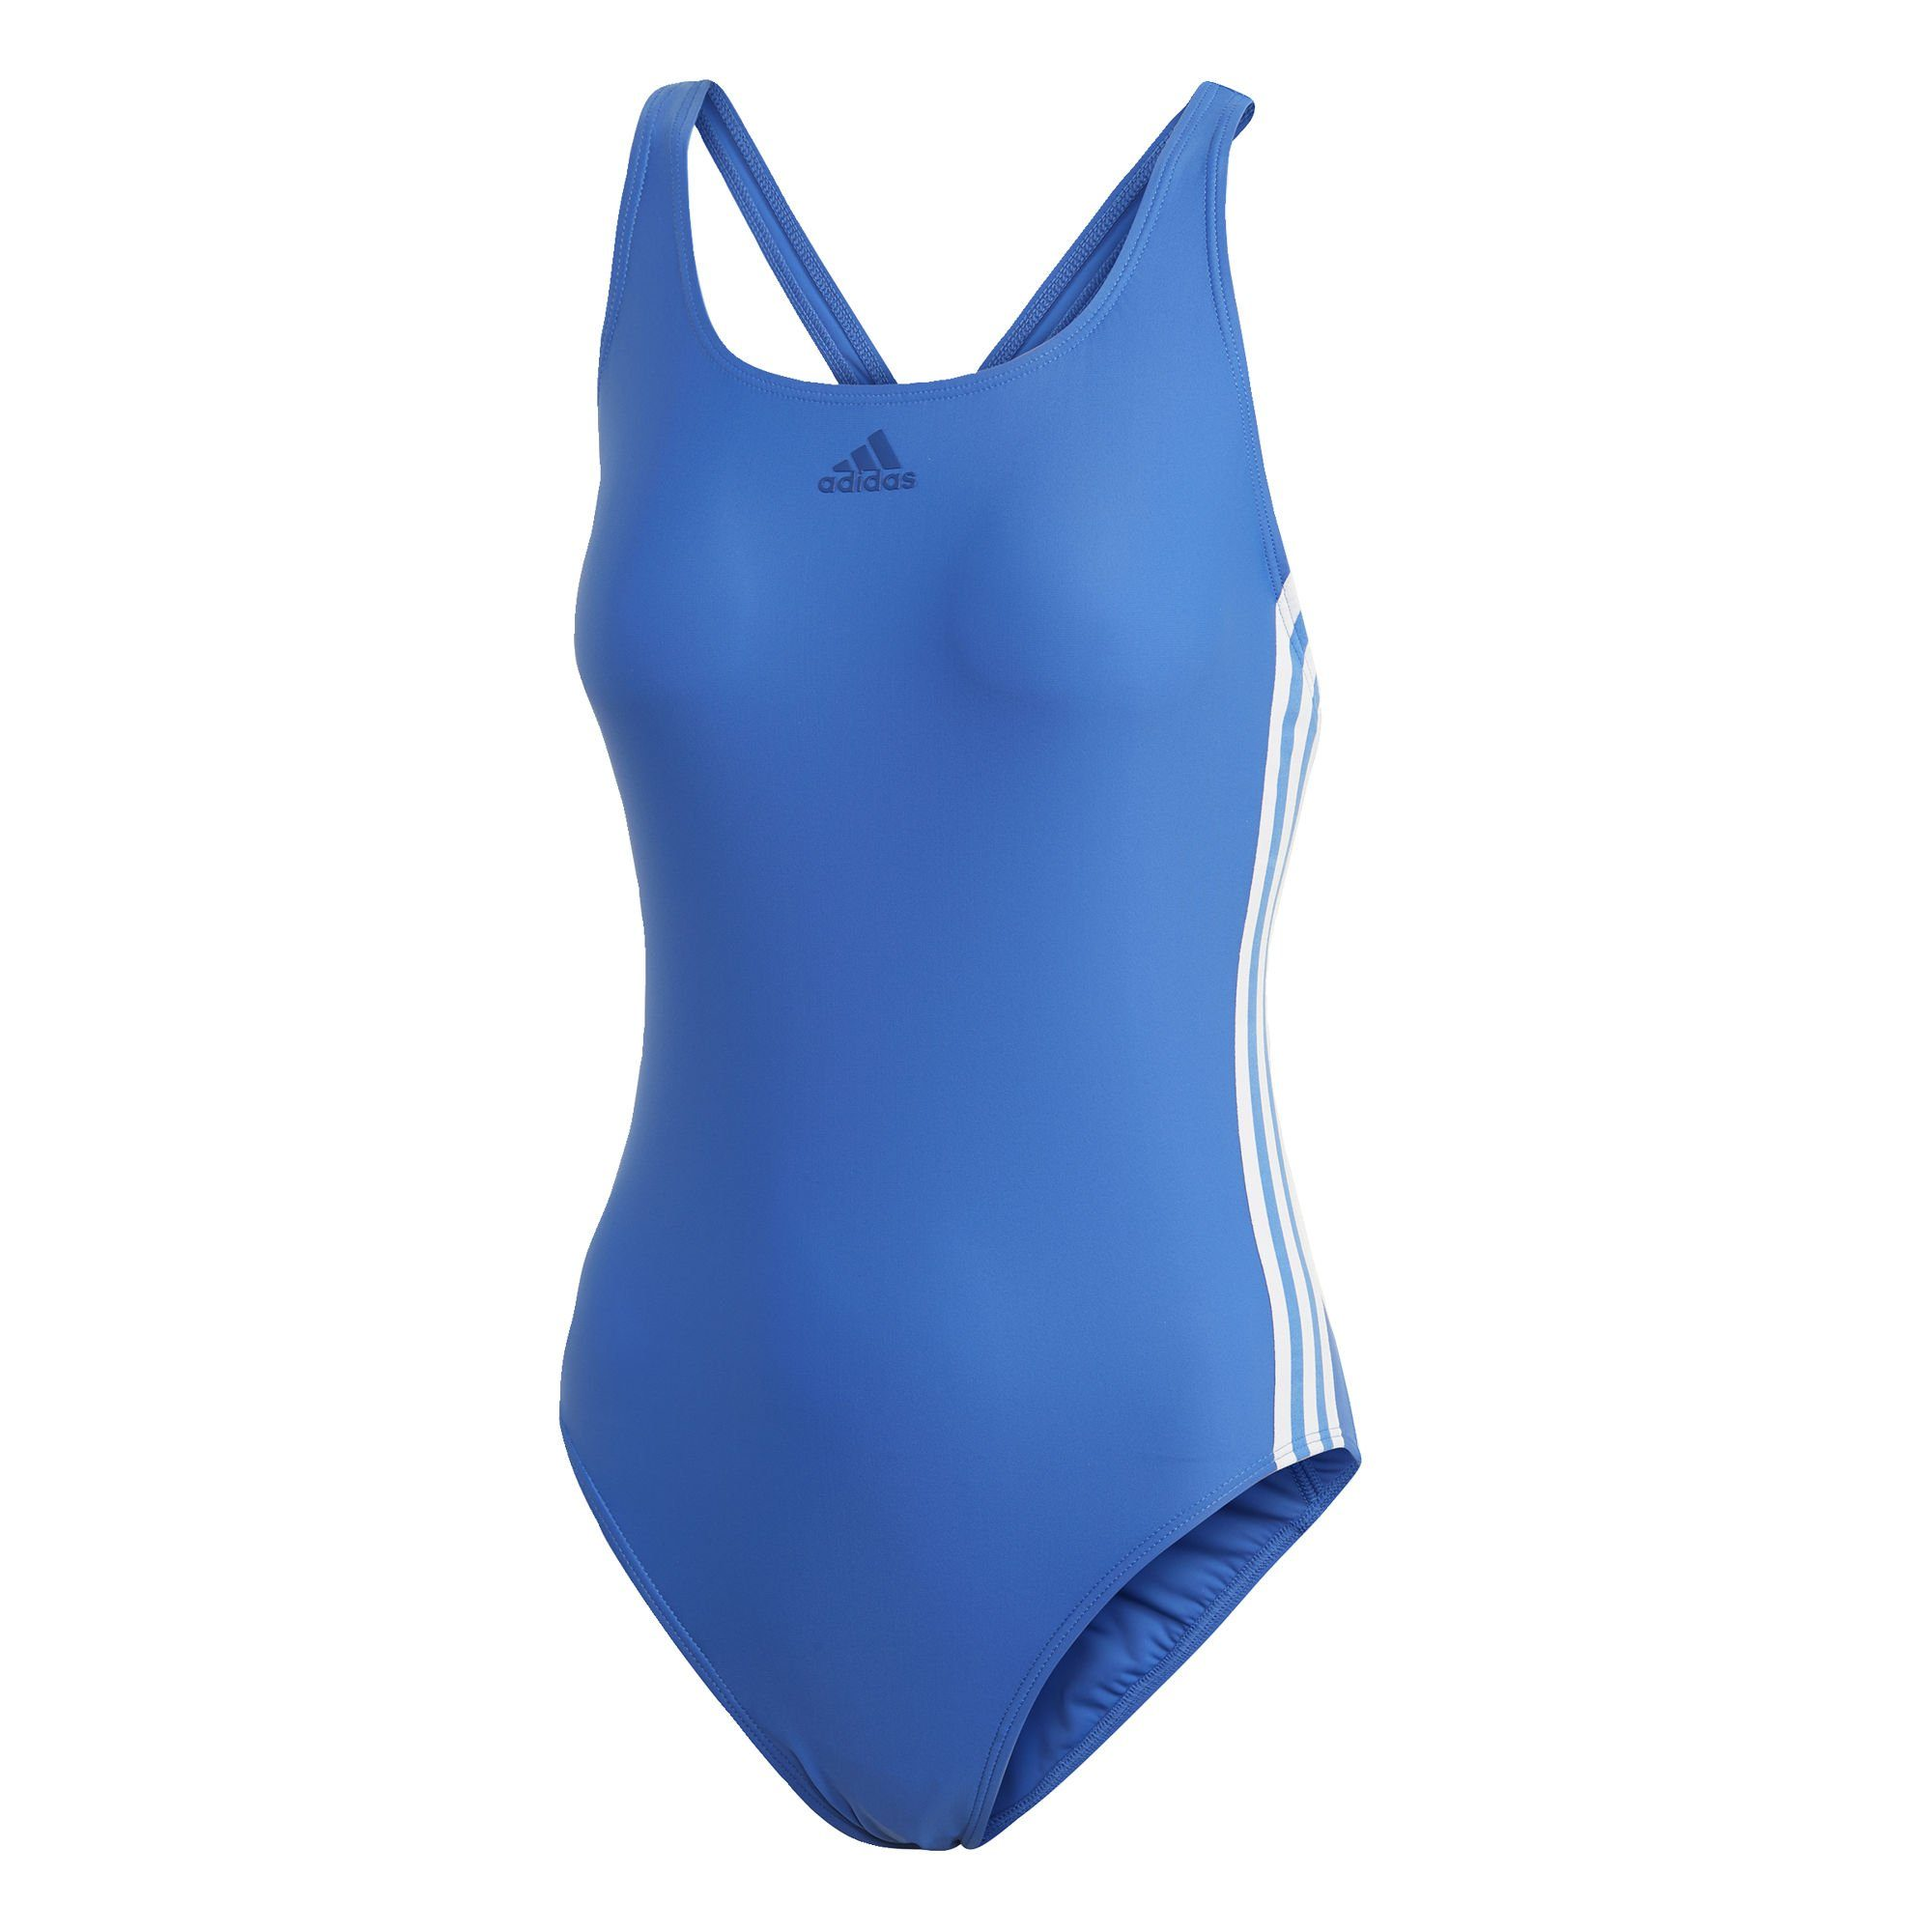 adidas Performance Kinder Badeanzug blau 140: Sport & Freizeit